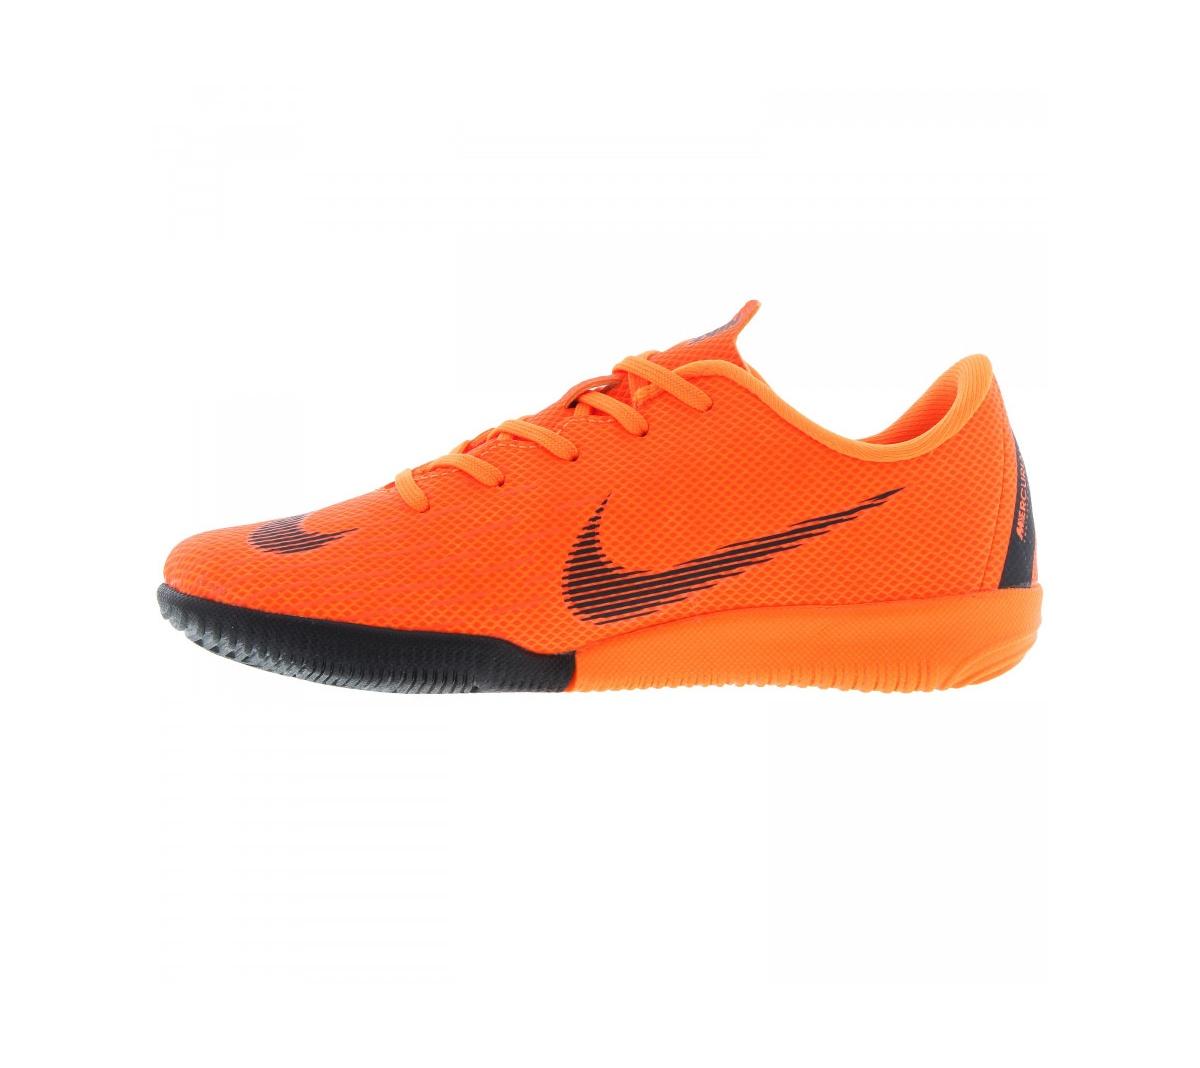 Tênis Nike Vapor 12 Academy PS Infantil Futsal